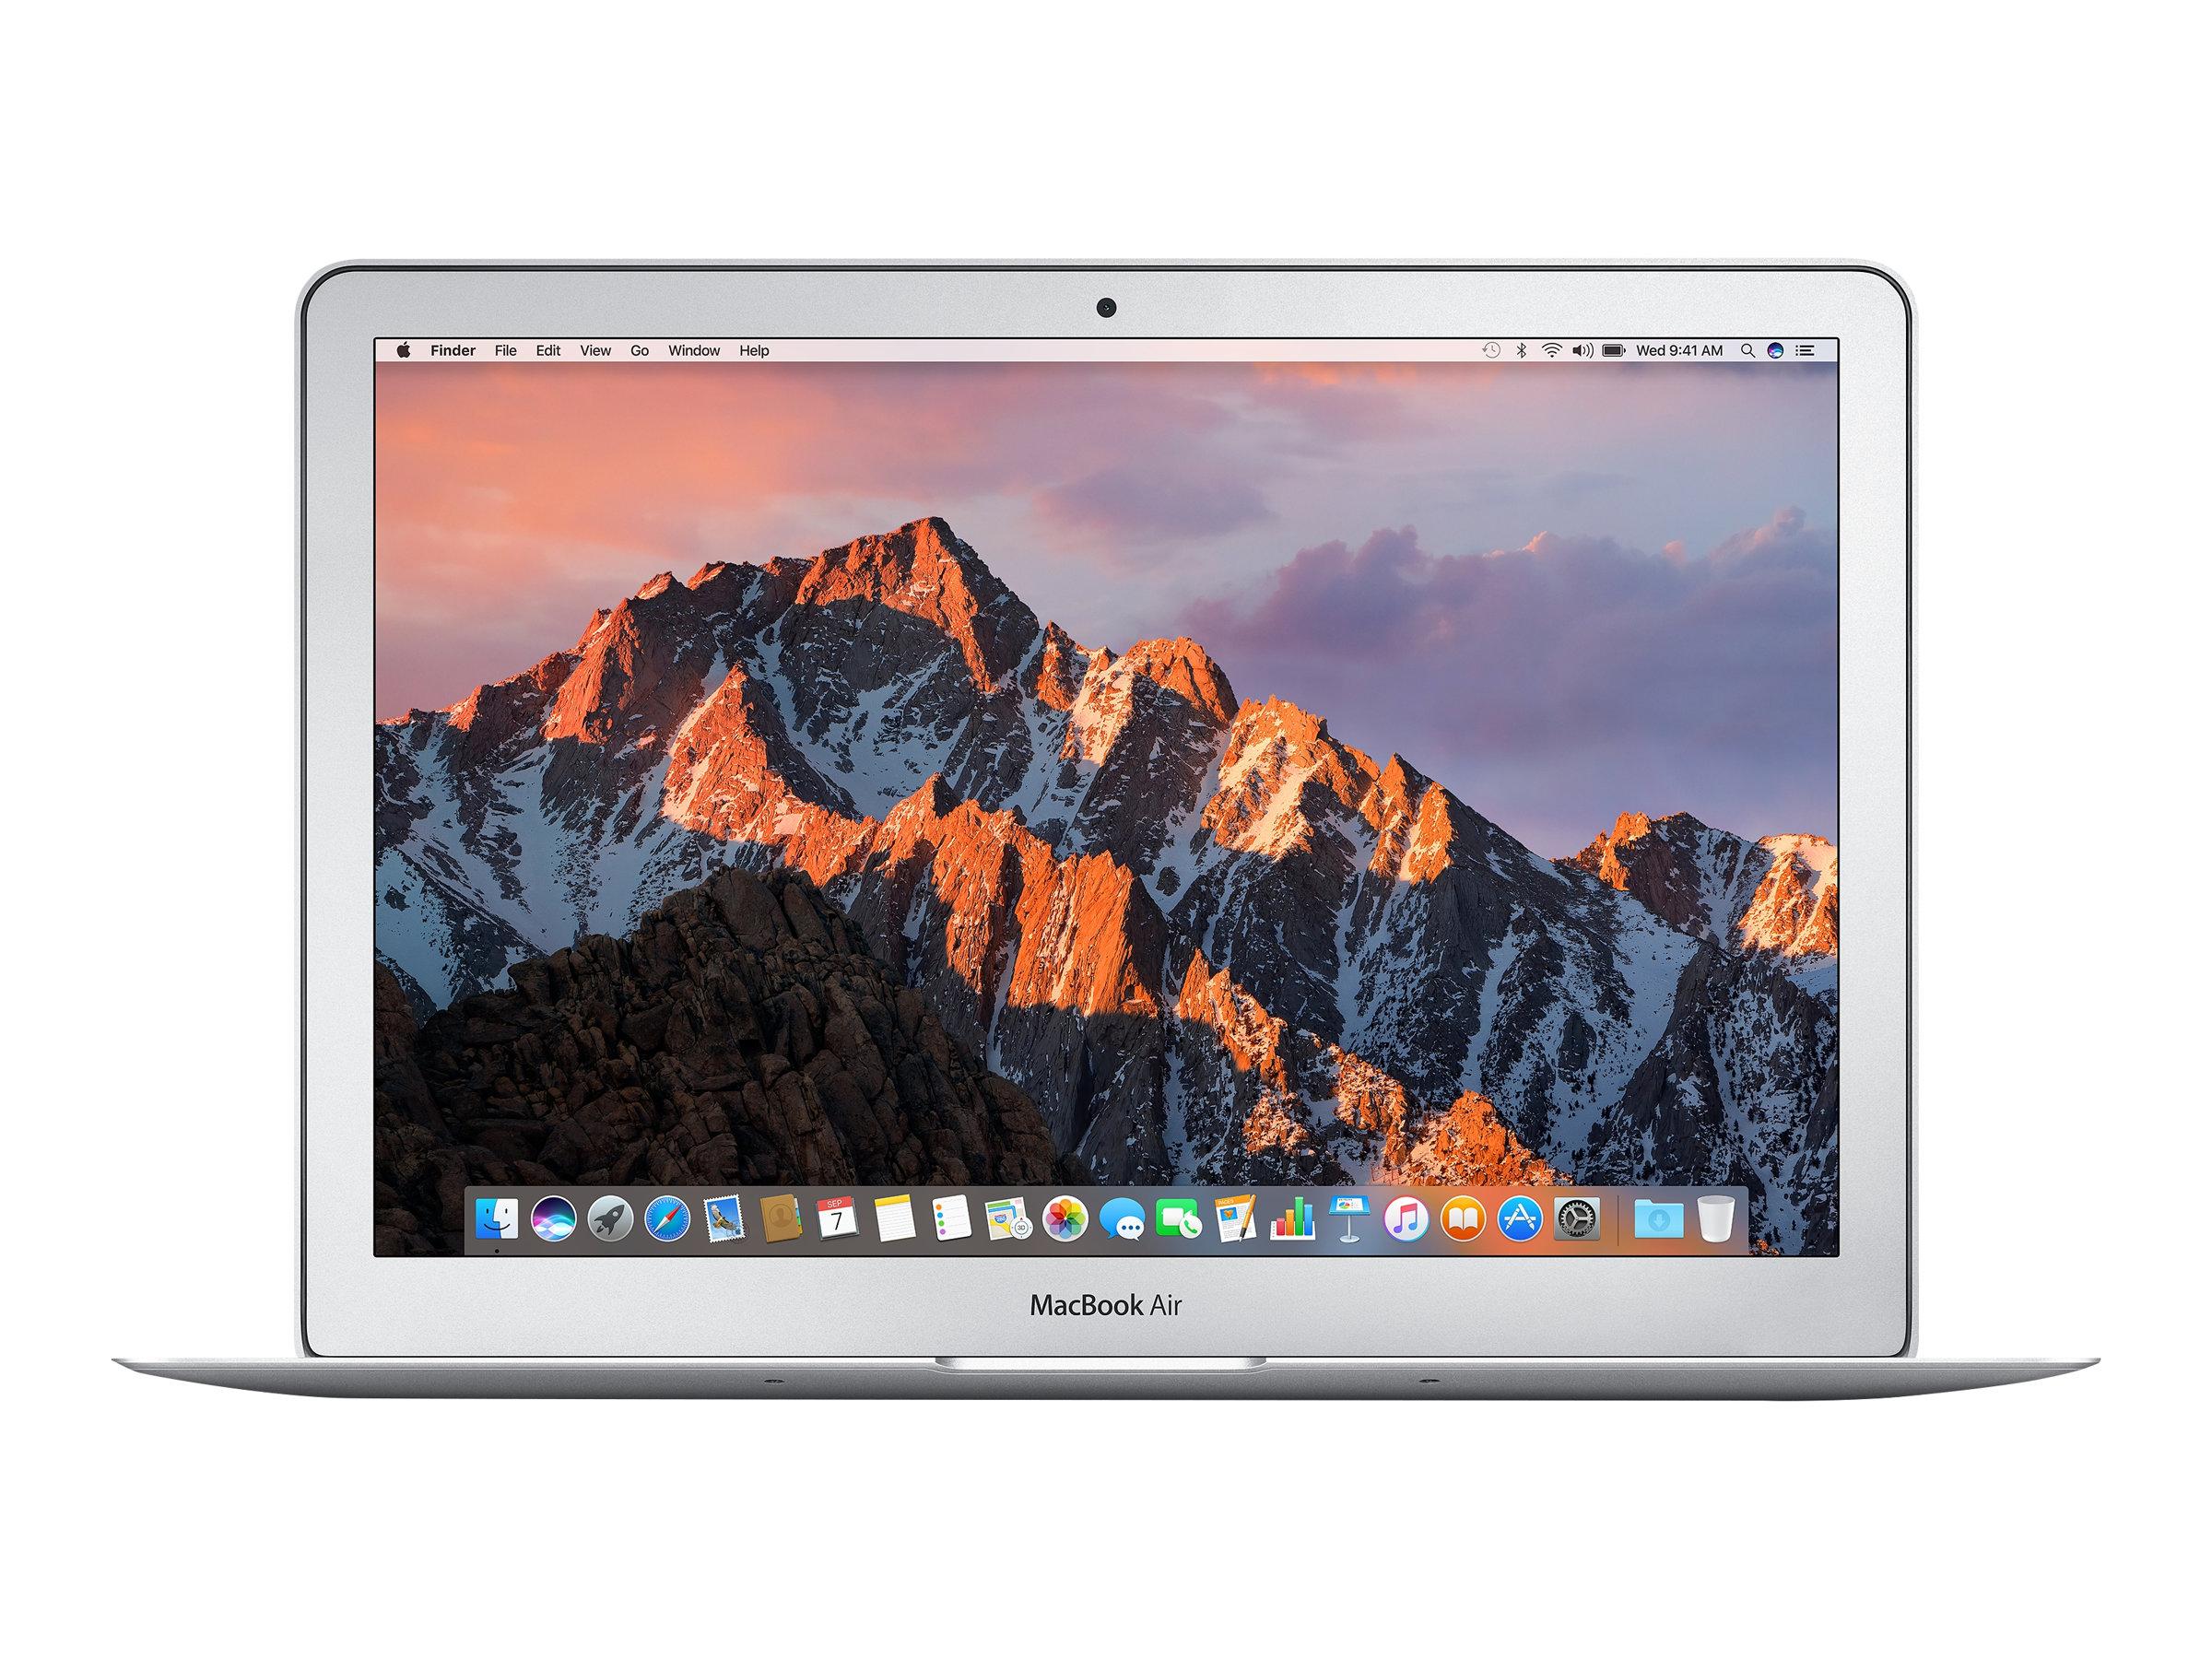 Apple MacBook Air 2017 - PC portable reconditionné 13.3'' grade B - Core I5 1,8GHZ - 8 Go - 256 Go SSD